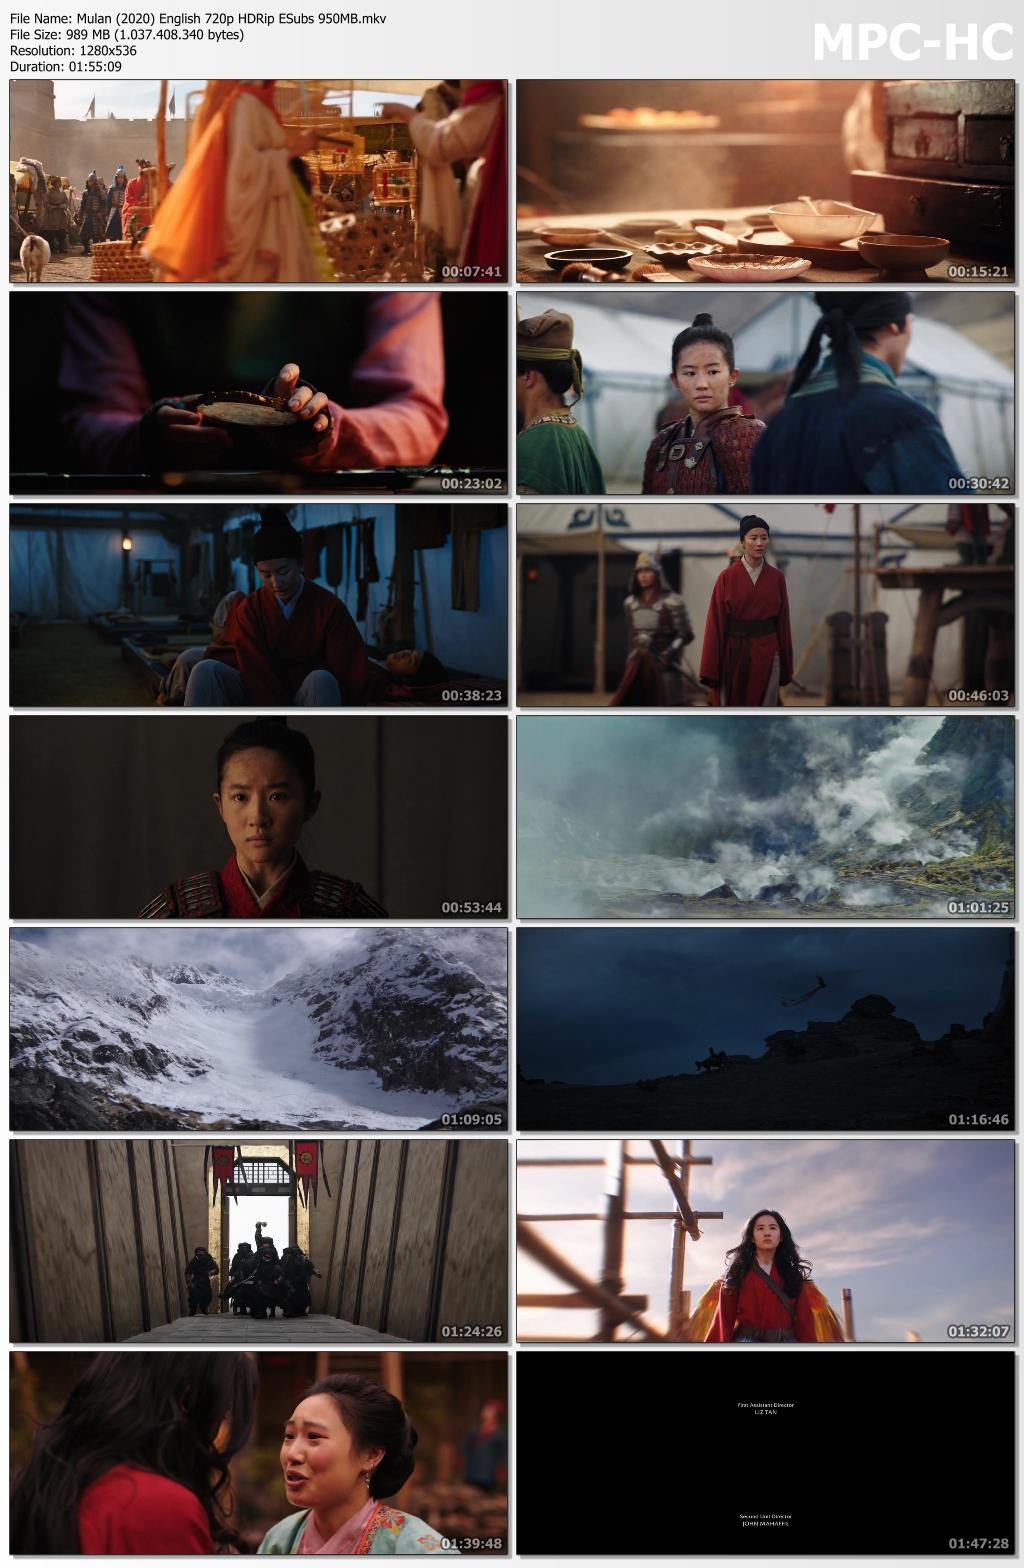 Mulan-2020-English-720p-HDRip-ESubs-950-MB-mkv-thumbs